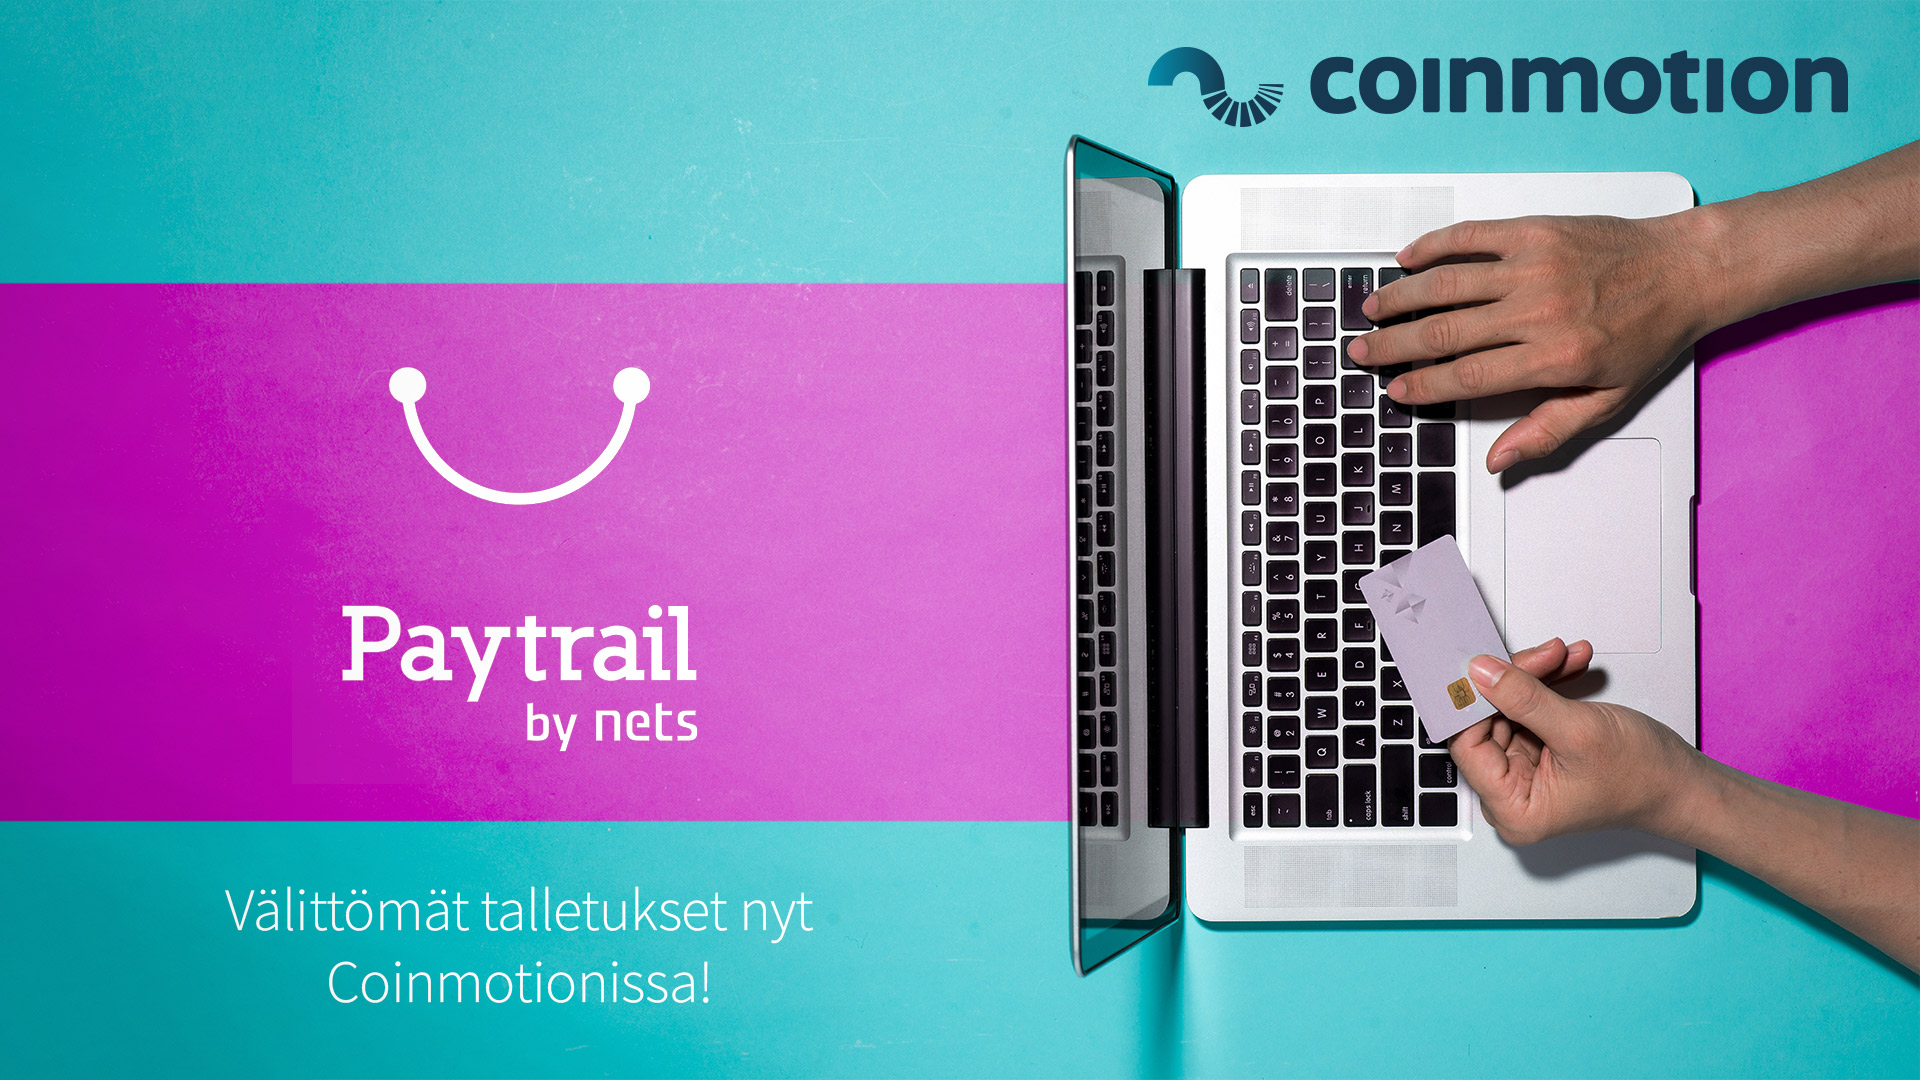 paytrail_coinmotion